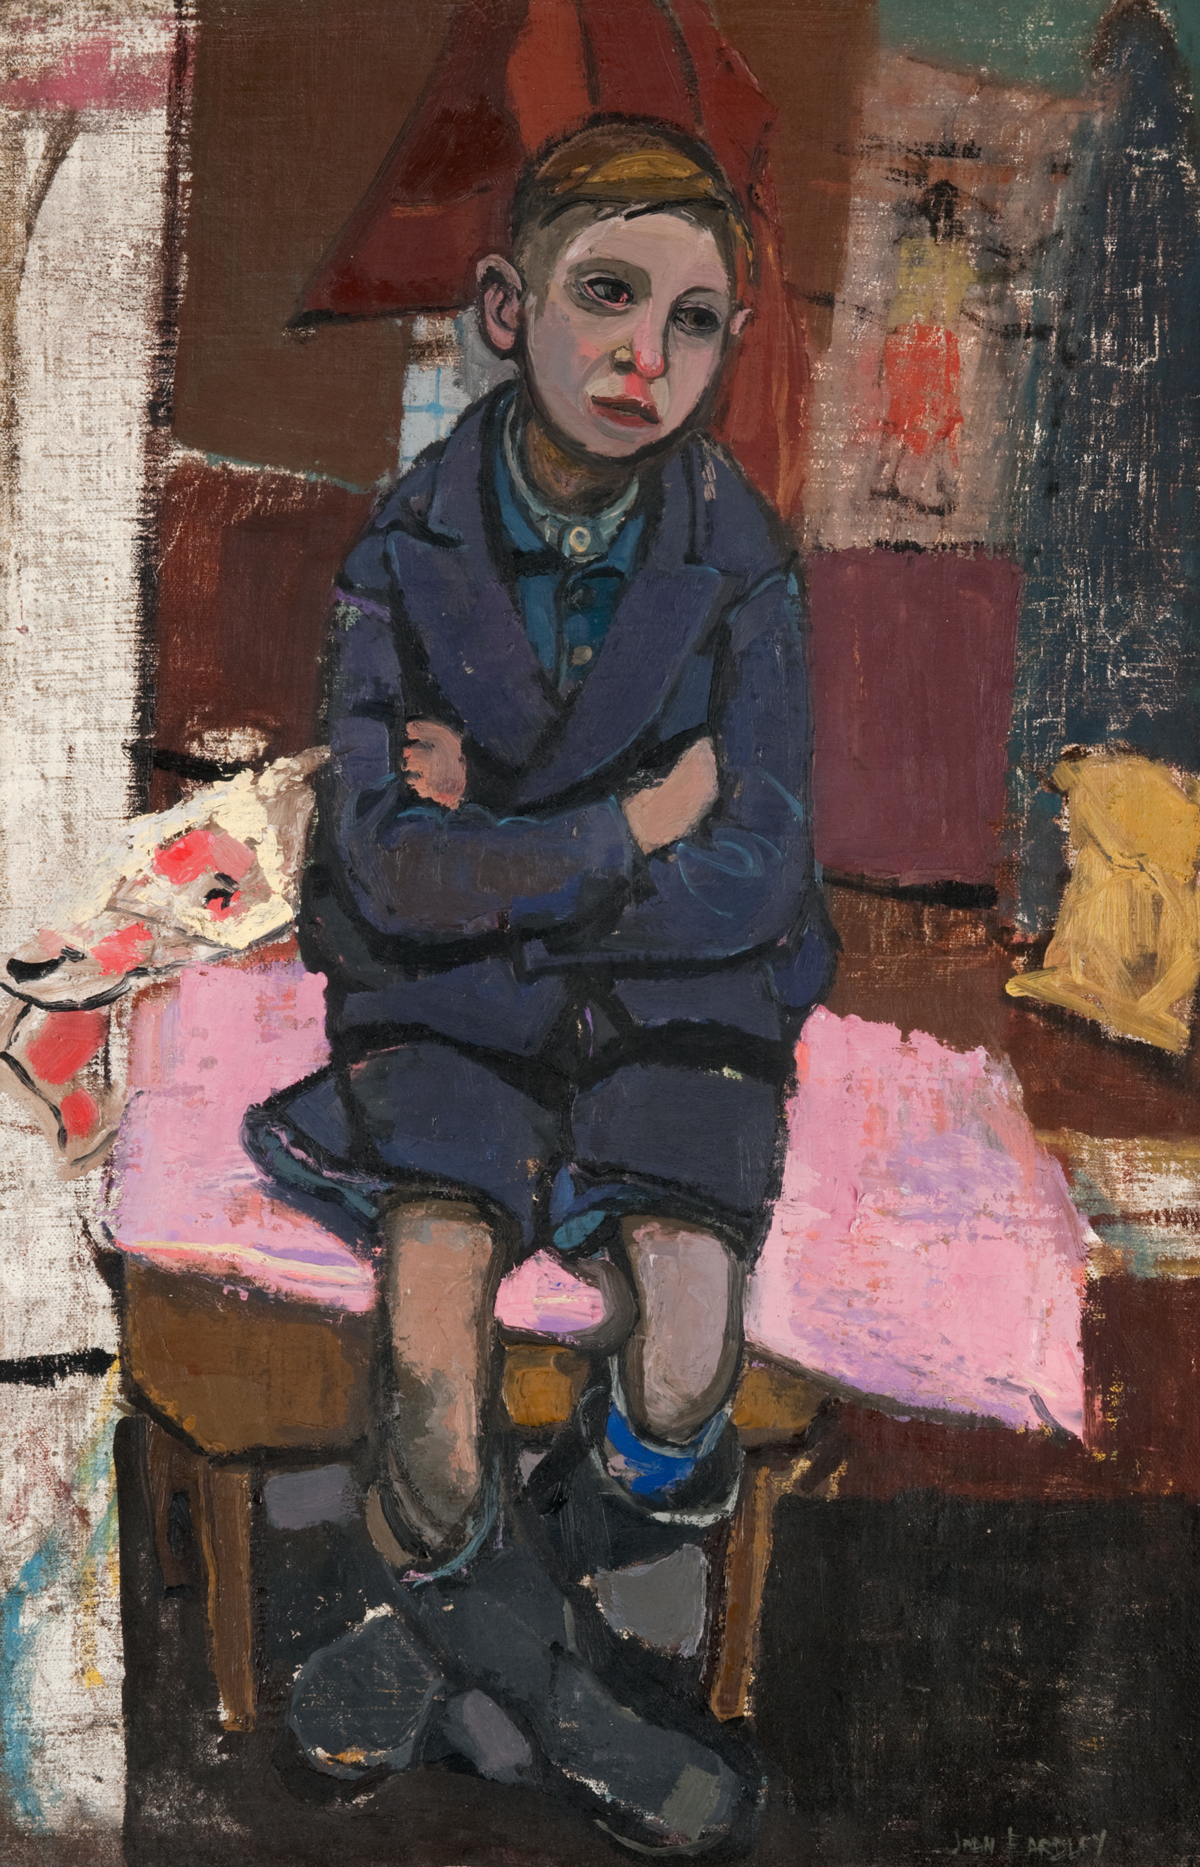 Joan Eardley, Boy on Stool, oil on canvas, 910 x 590mm, copyright Eardley Estate, Paisley Museum and Art Galleries, held by Renfrewshire Leisure on behalf of Renfrewshire Council